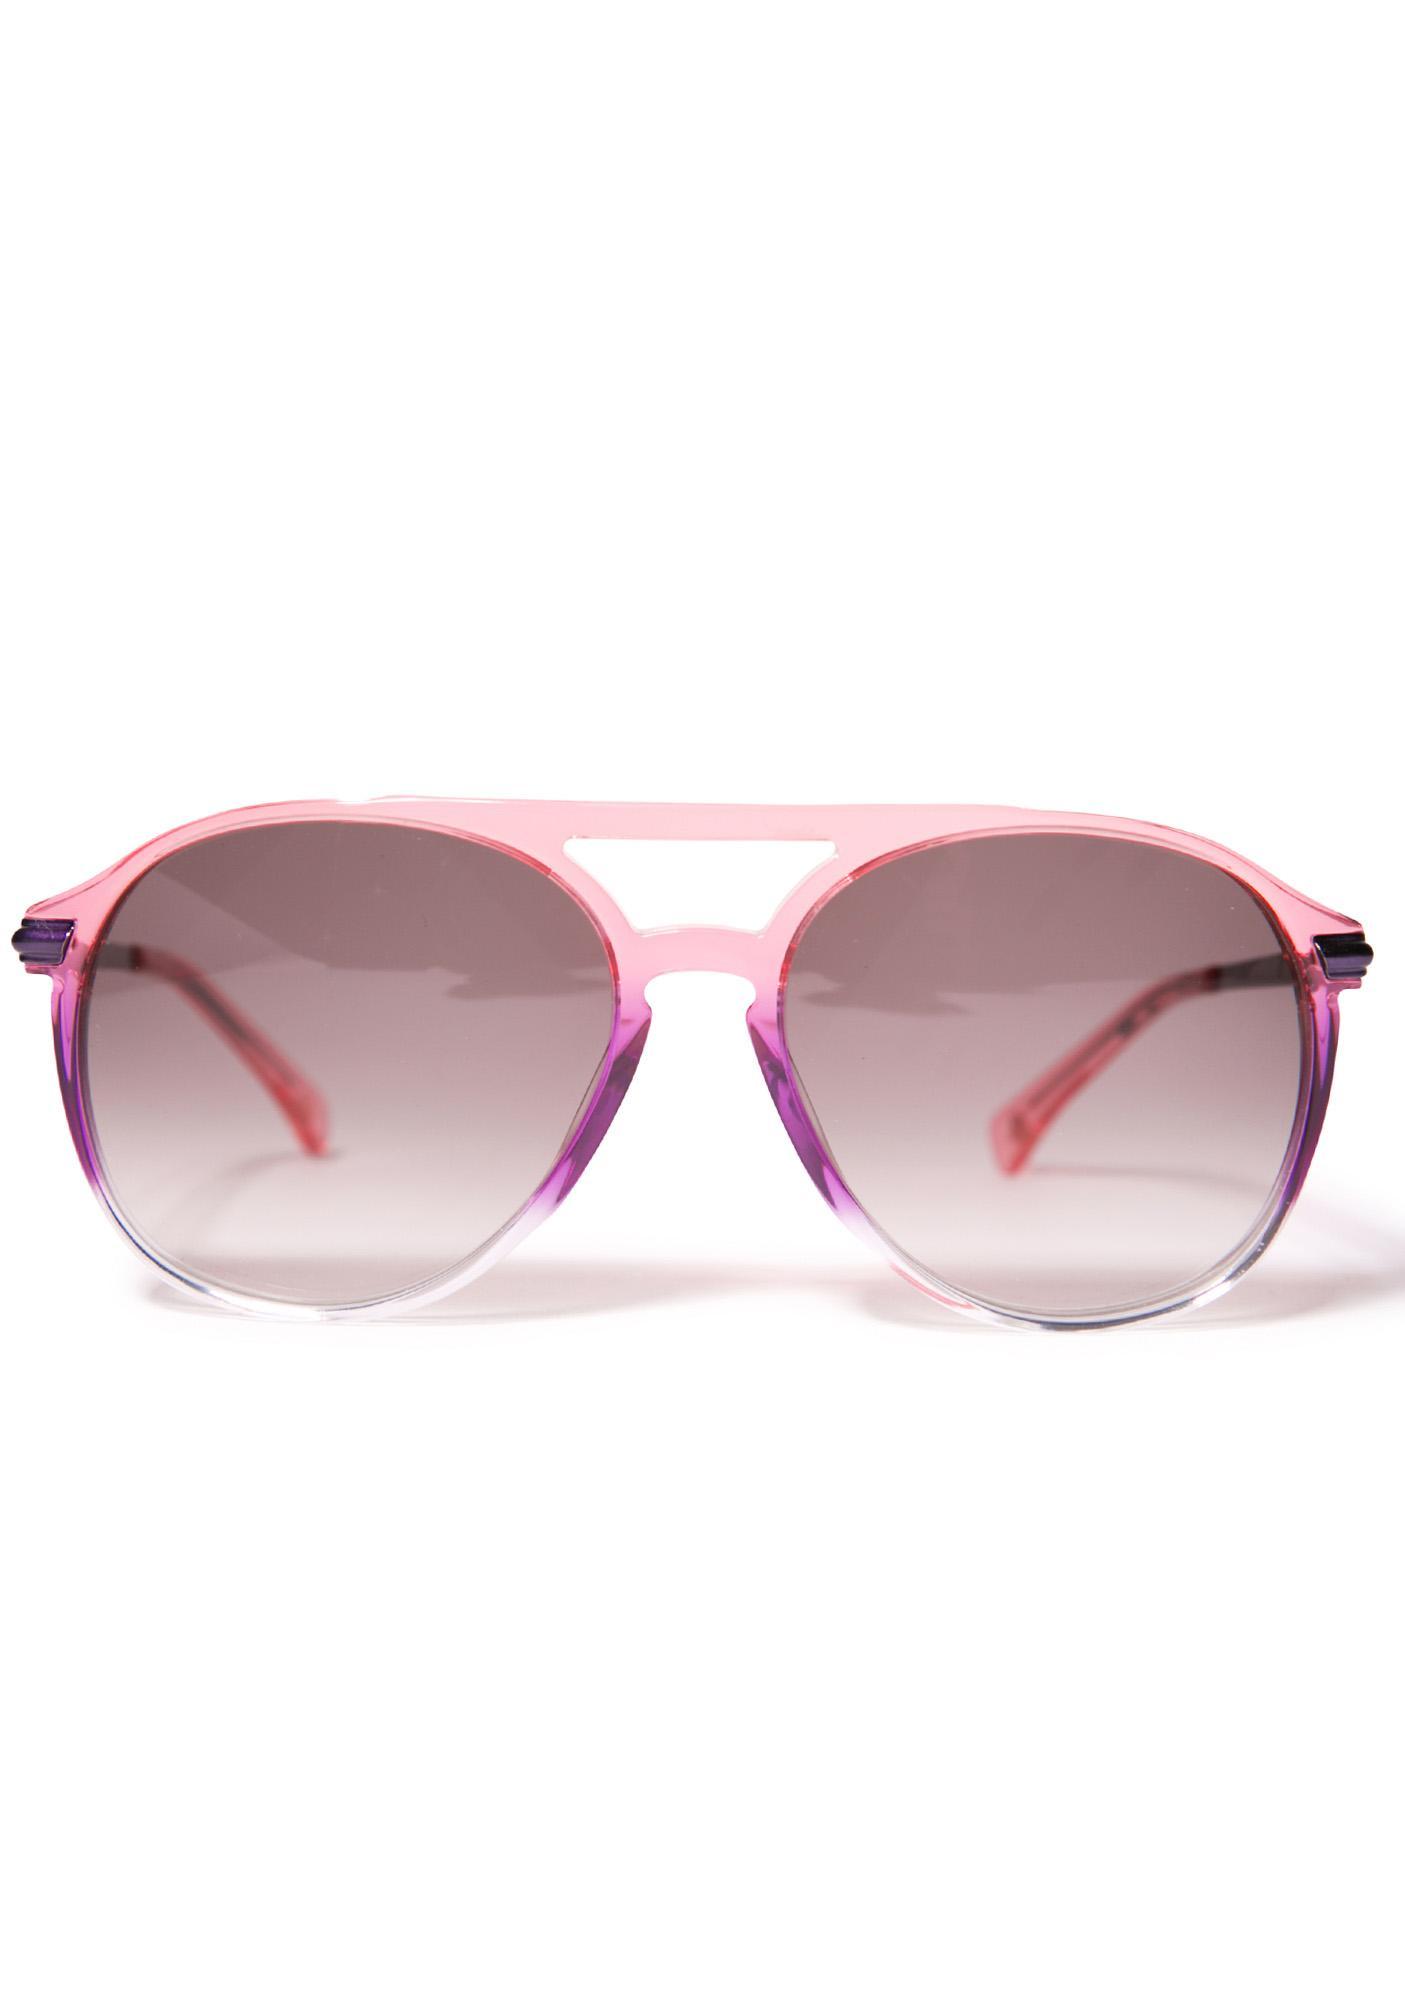 Wildfox Couture Baroness Sunglasses